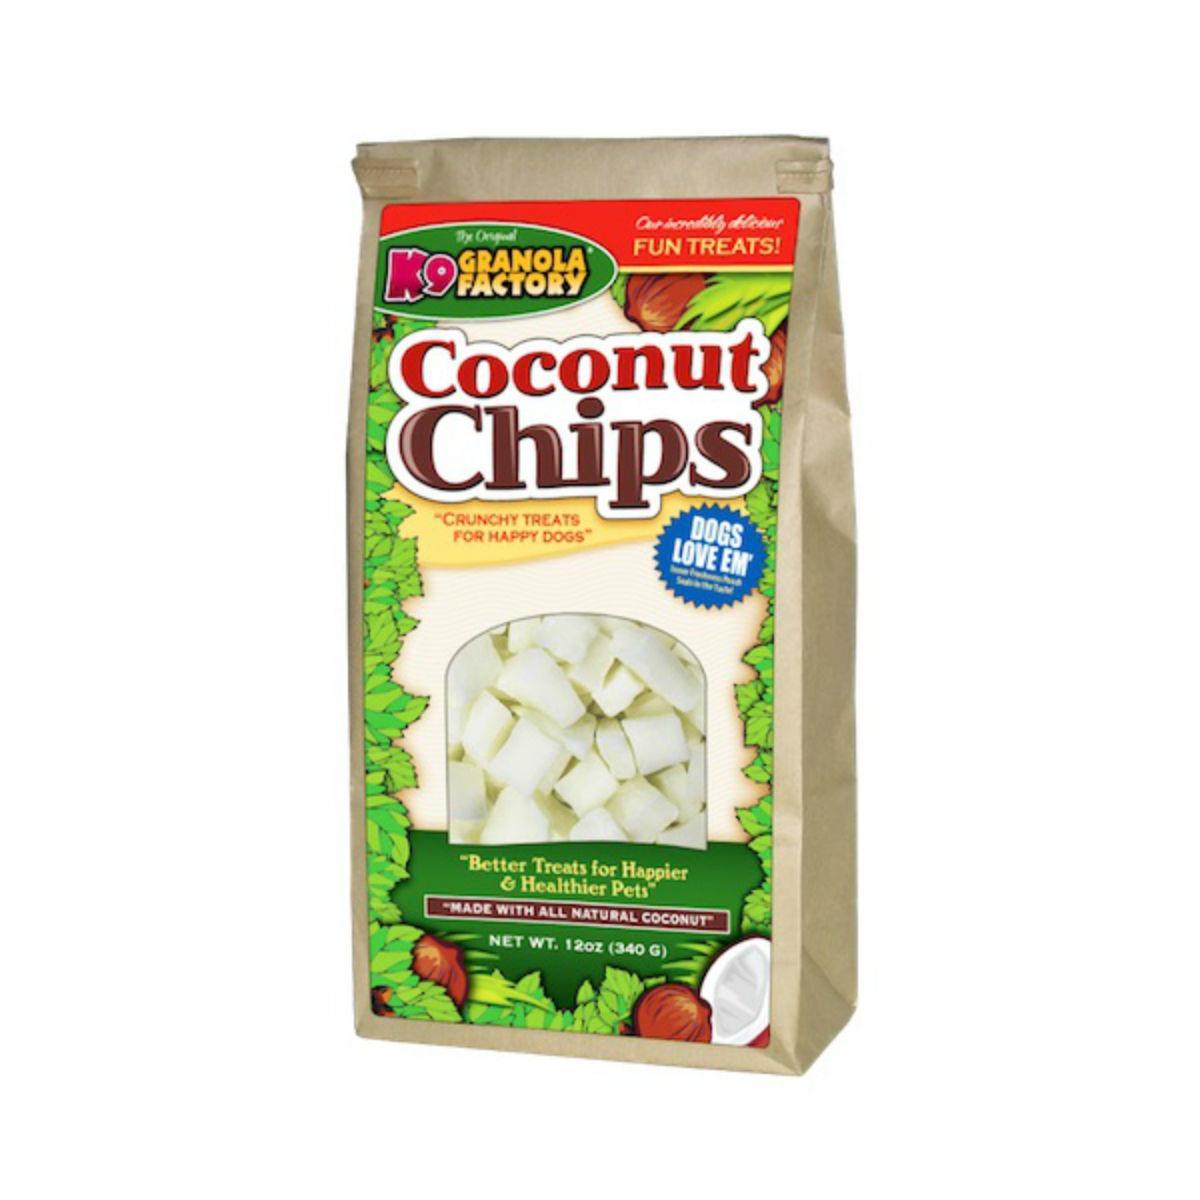 K9 Granola Factory Coconut Chips Dog Treat by K9 Granola Factory